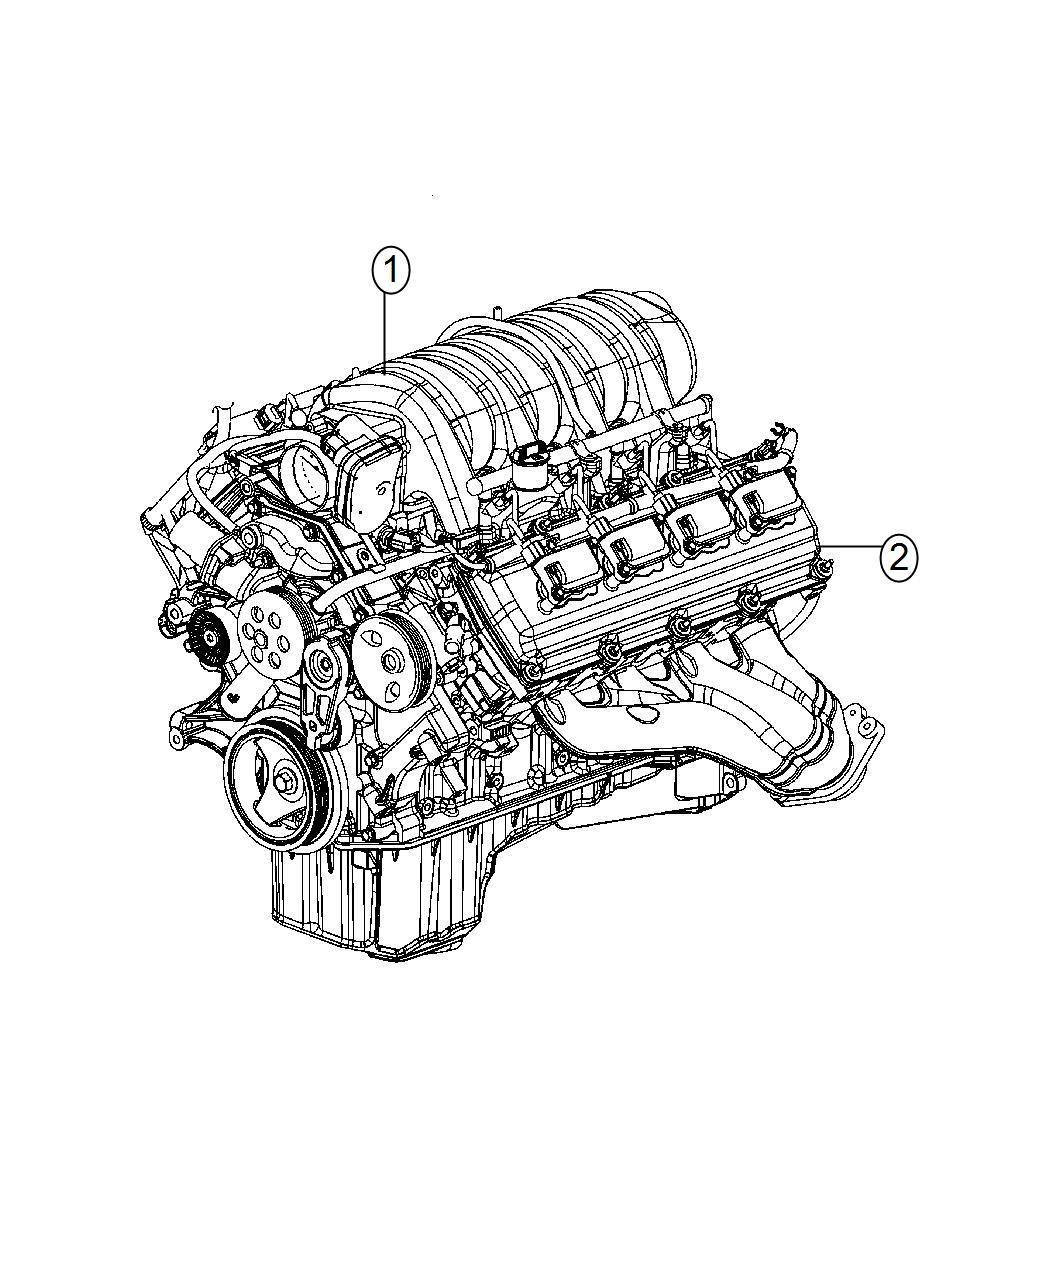 Dodge Challenger Engine Long Block European Equipment